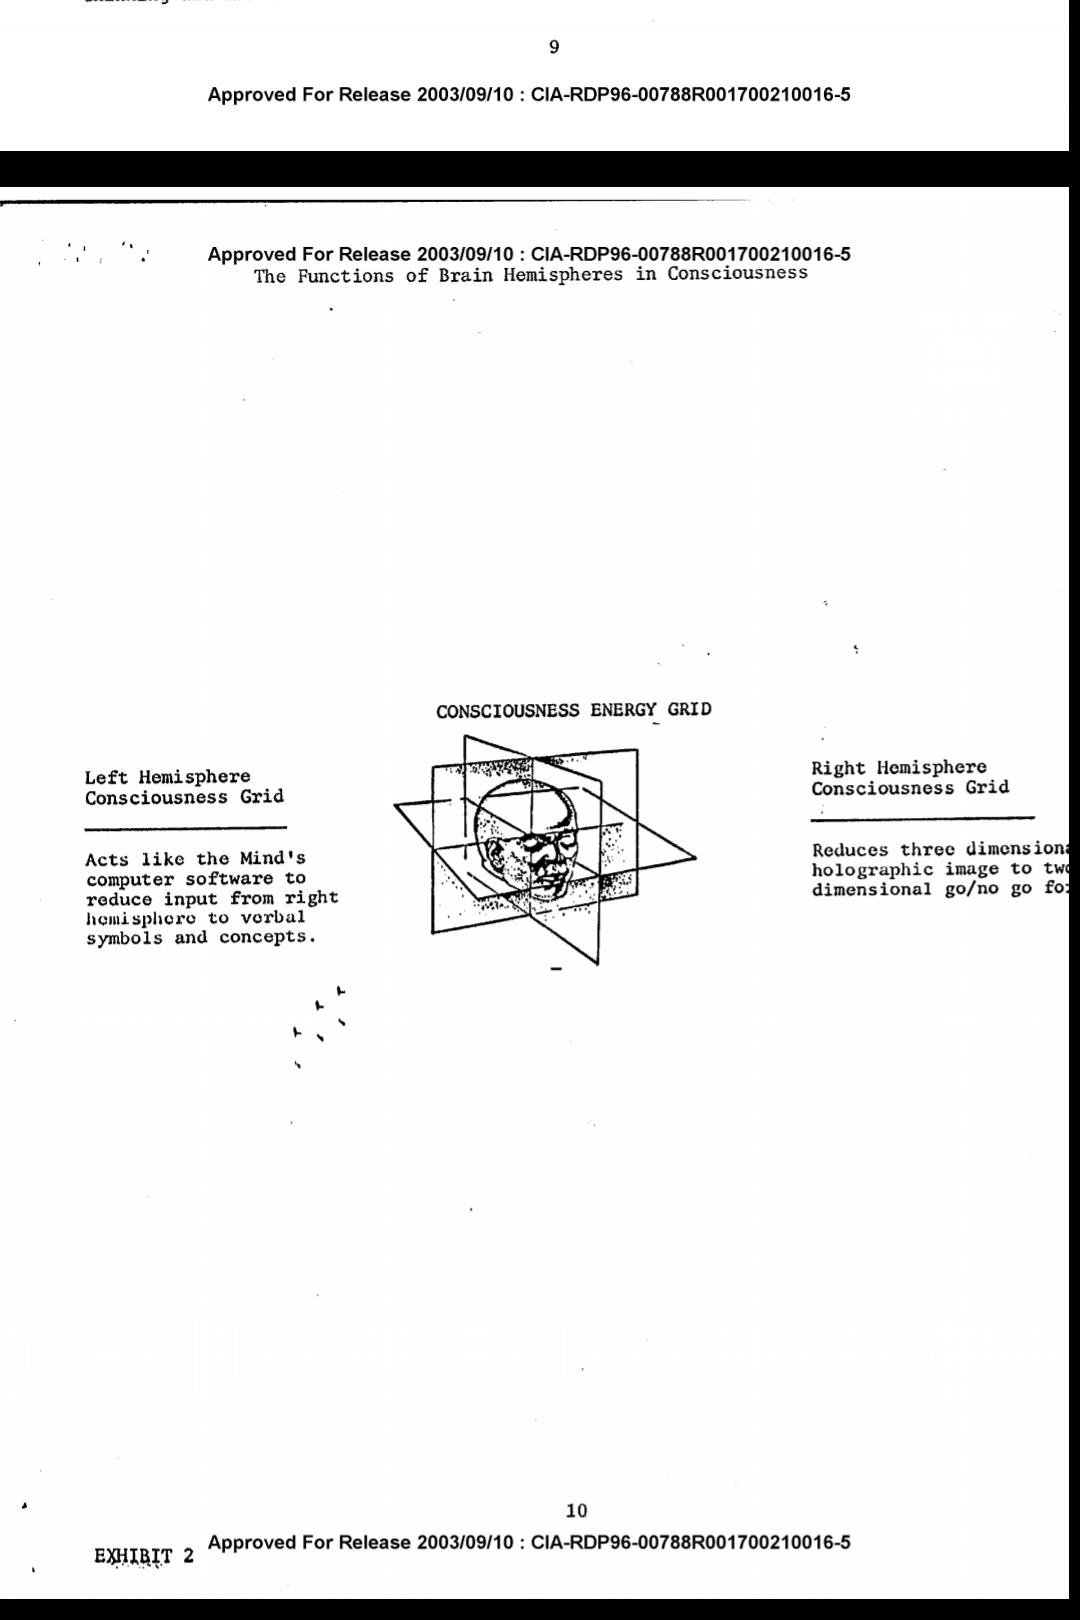 Official CIA Documentation on Remote Viewing | DavidShurter com